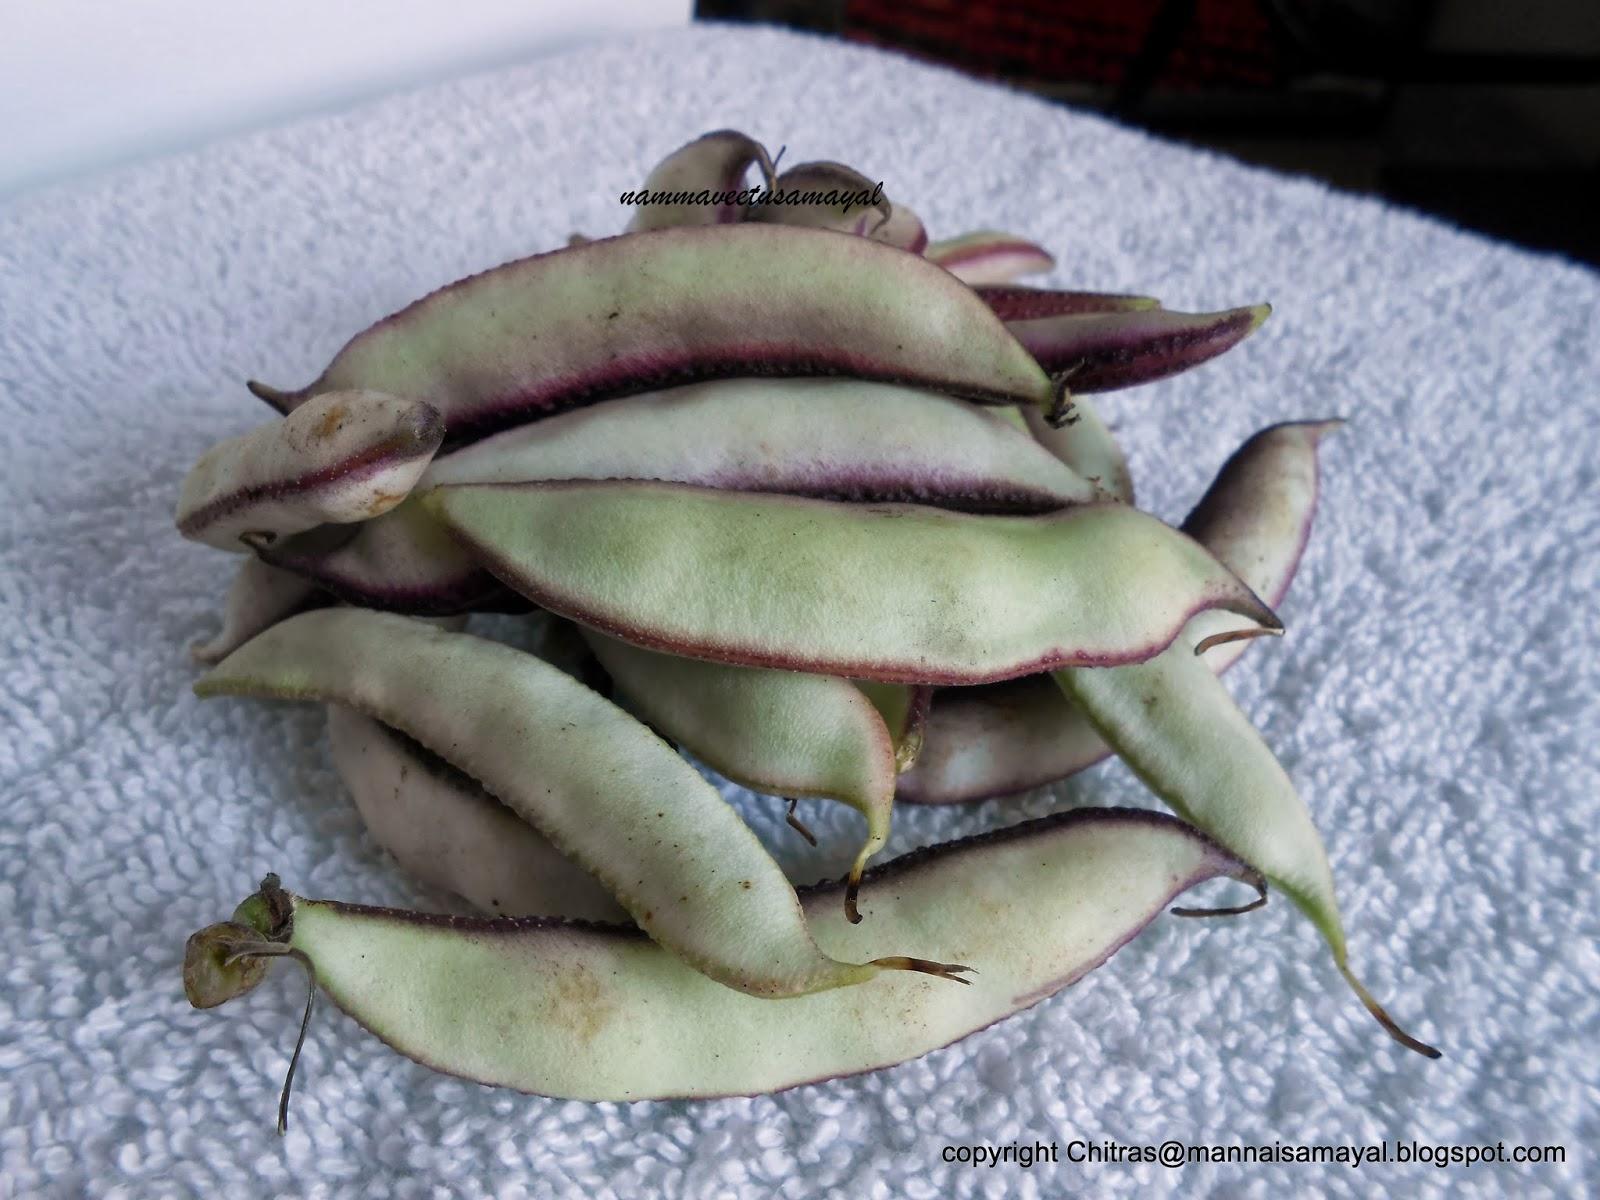 Avarakkai [ Broad Beans ]